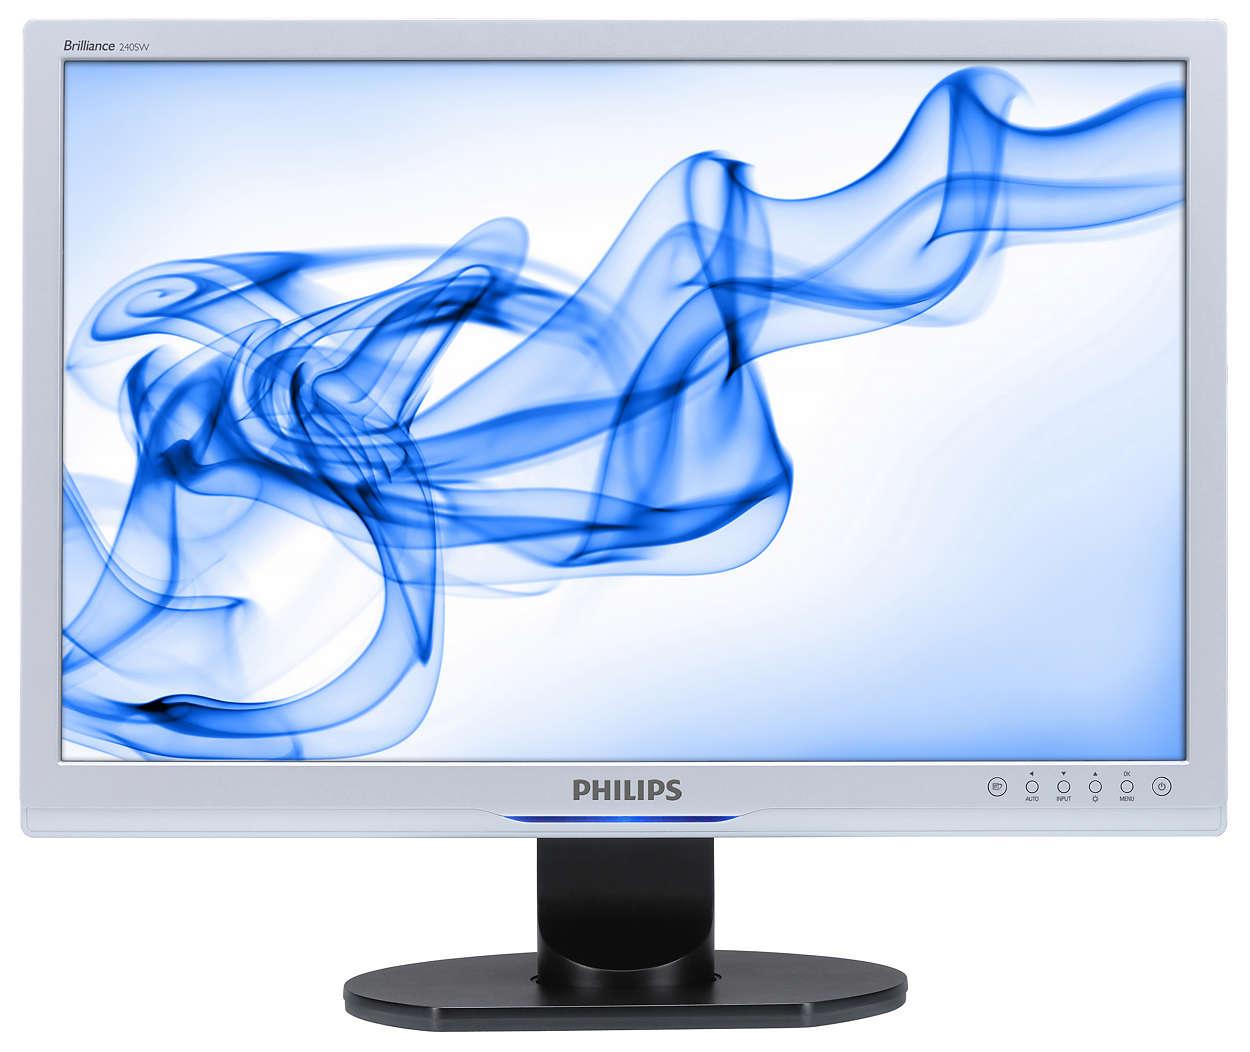 Monitor panorâmico grande para maior produtividade empresarial